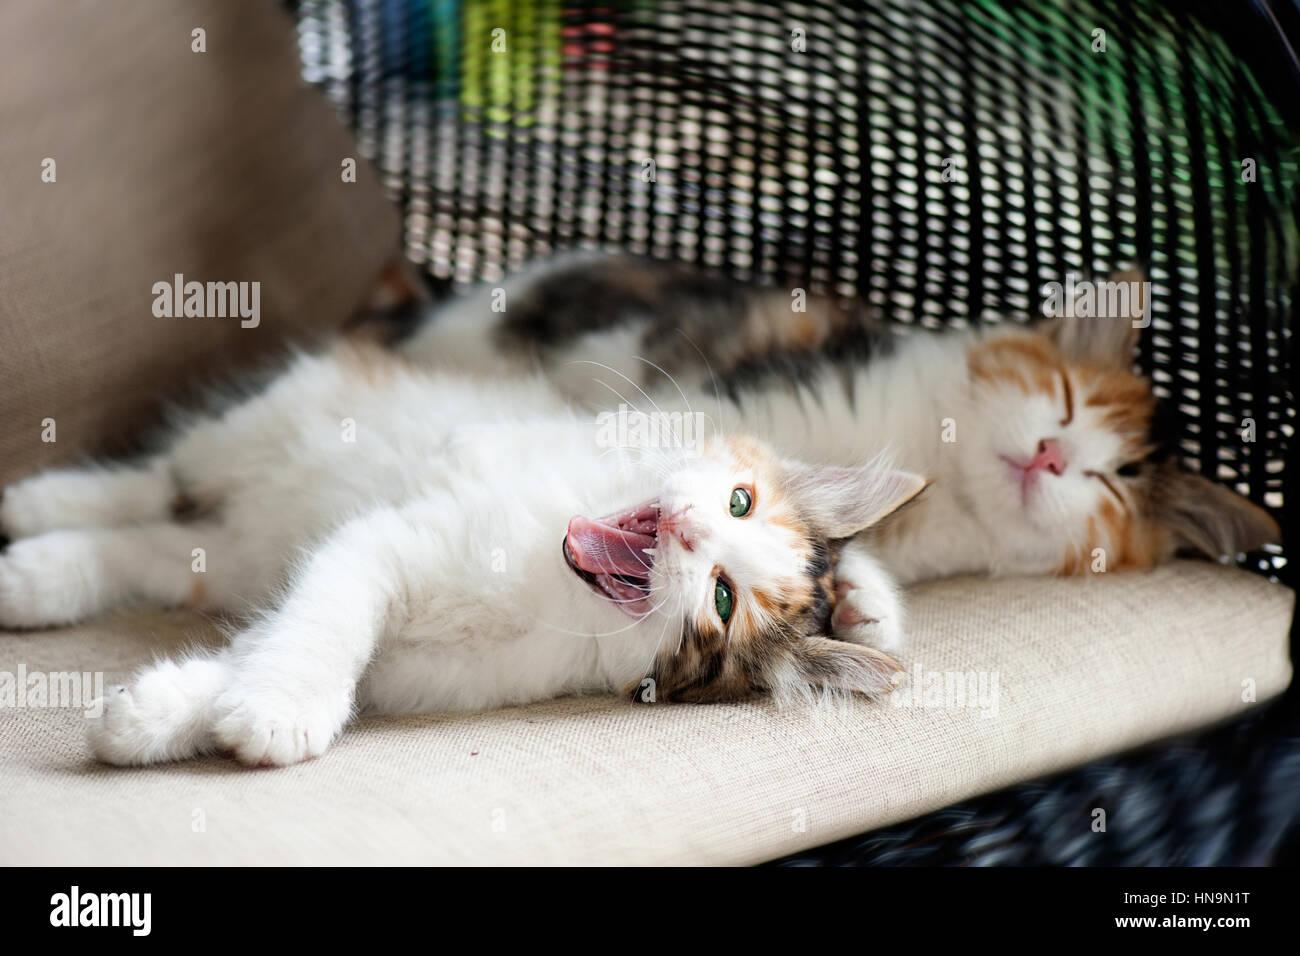 Schlaf und sleepy kitten Stockbild